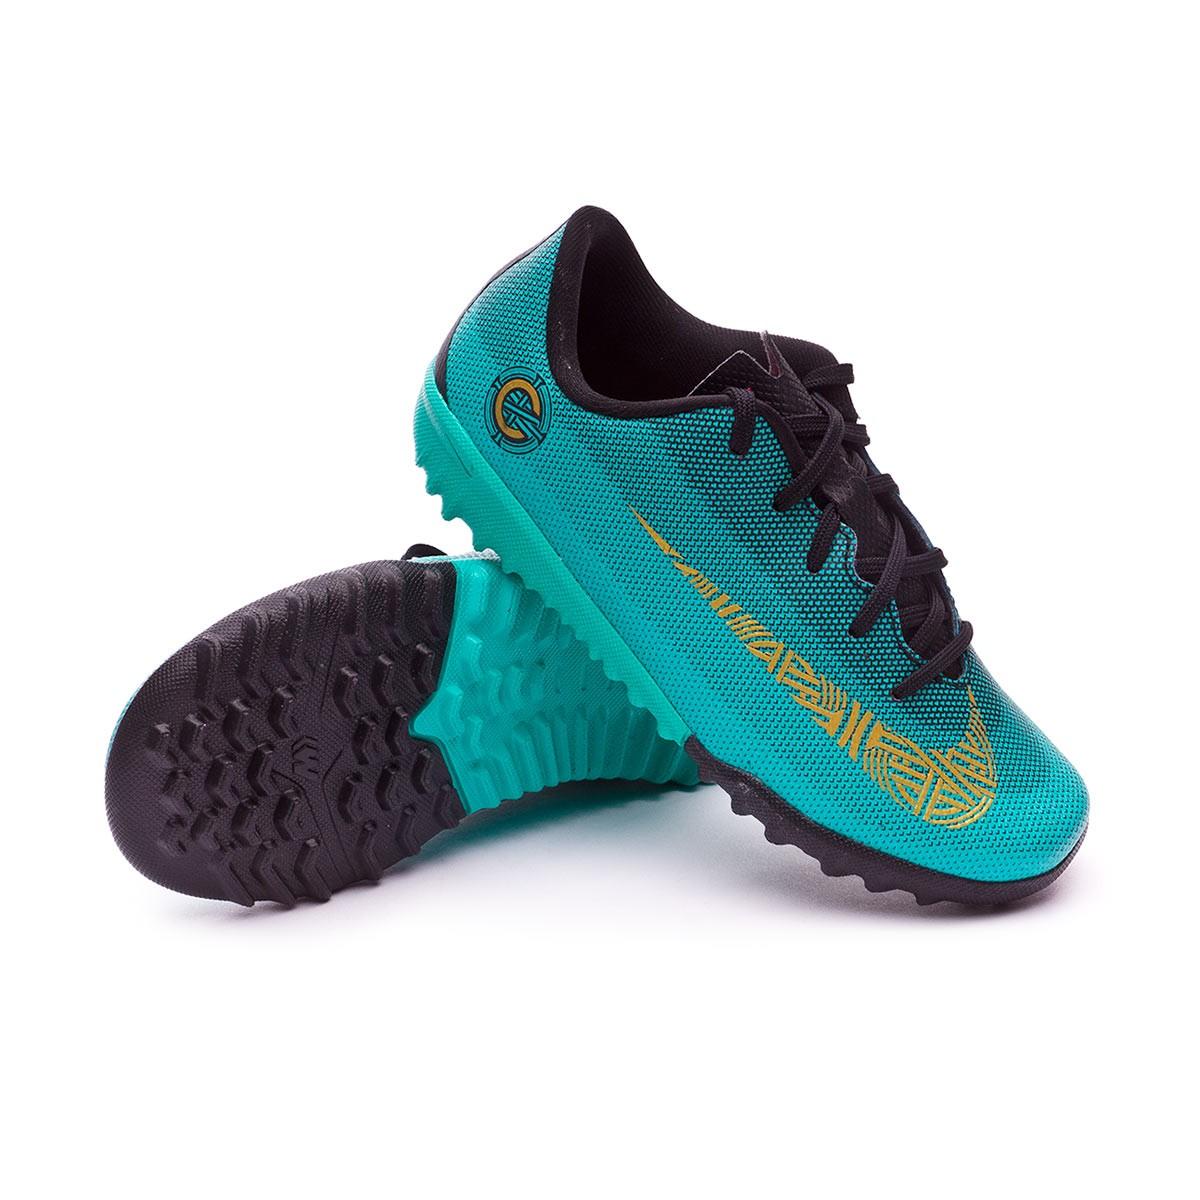 eb1455cd5e86 Football Boot Nike Kids Mercurial VaporX XII Academy PS CR7 Turf ...